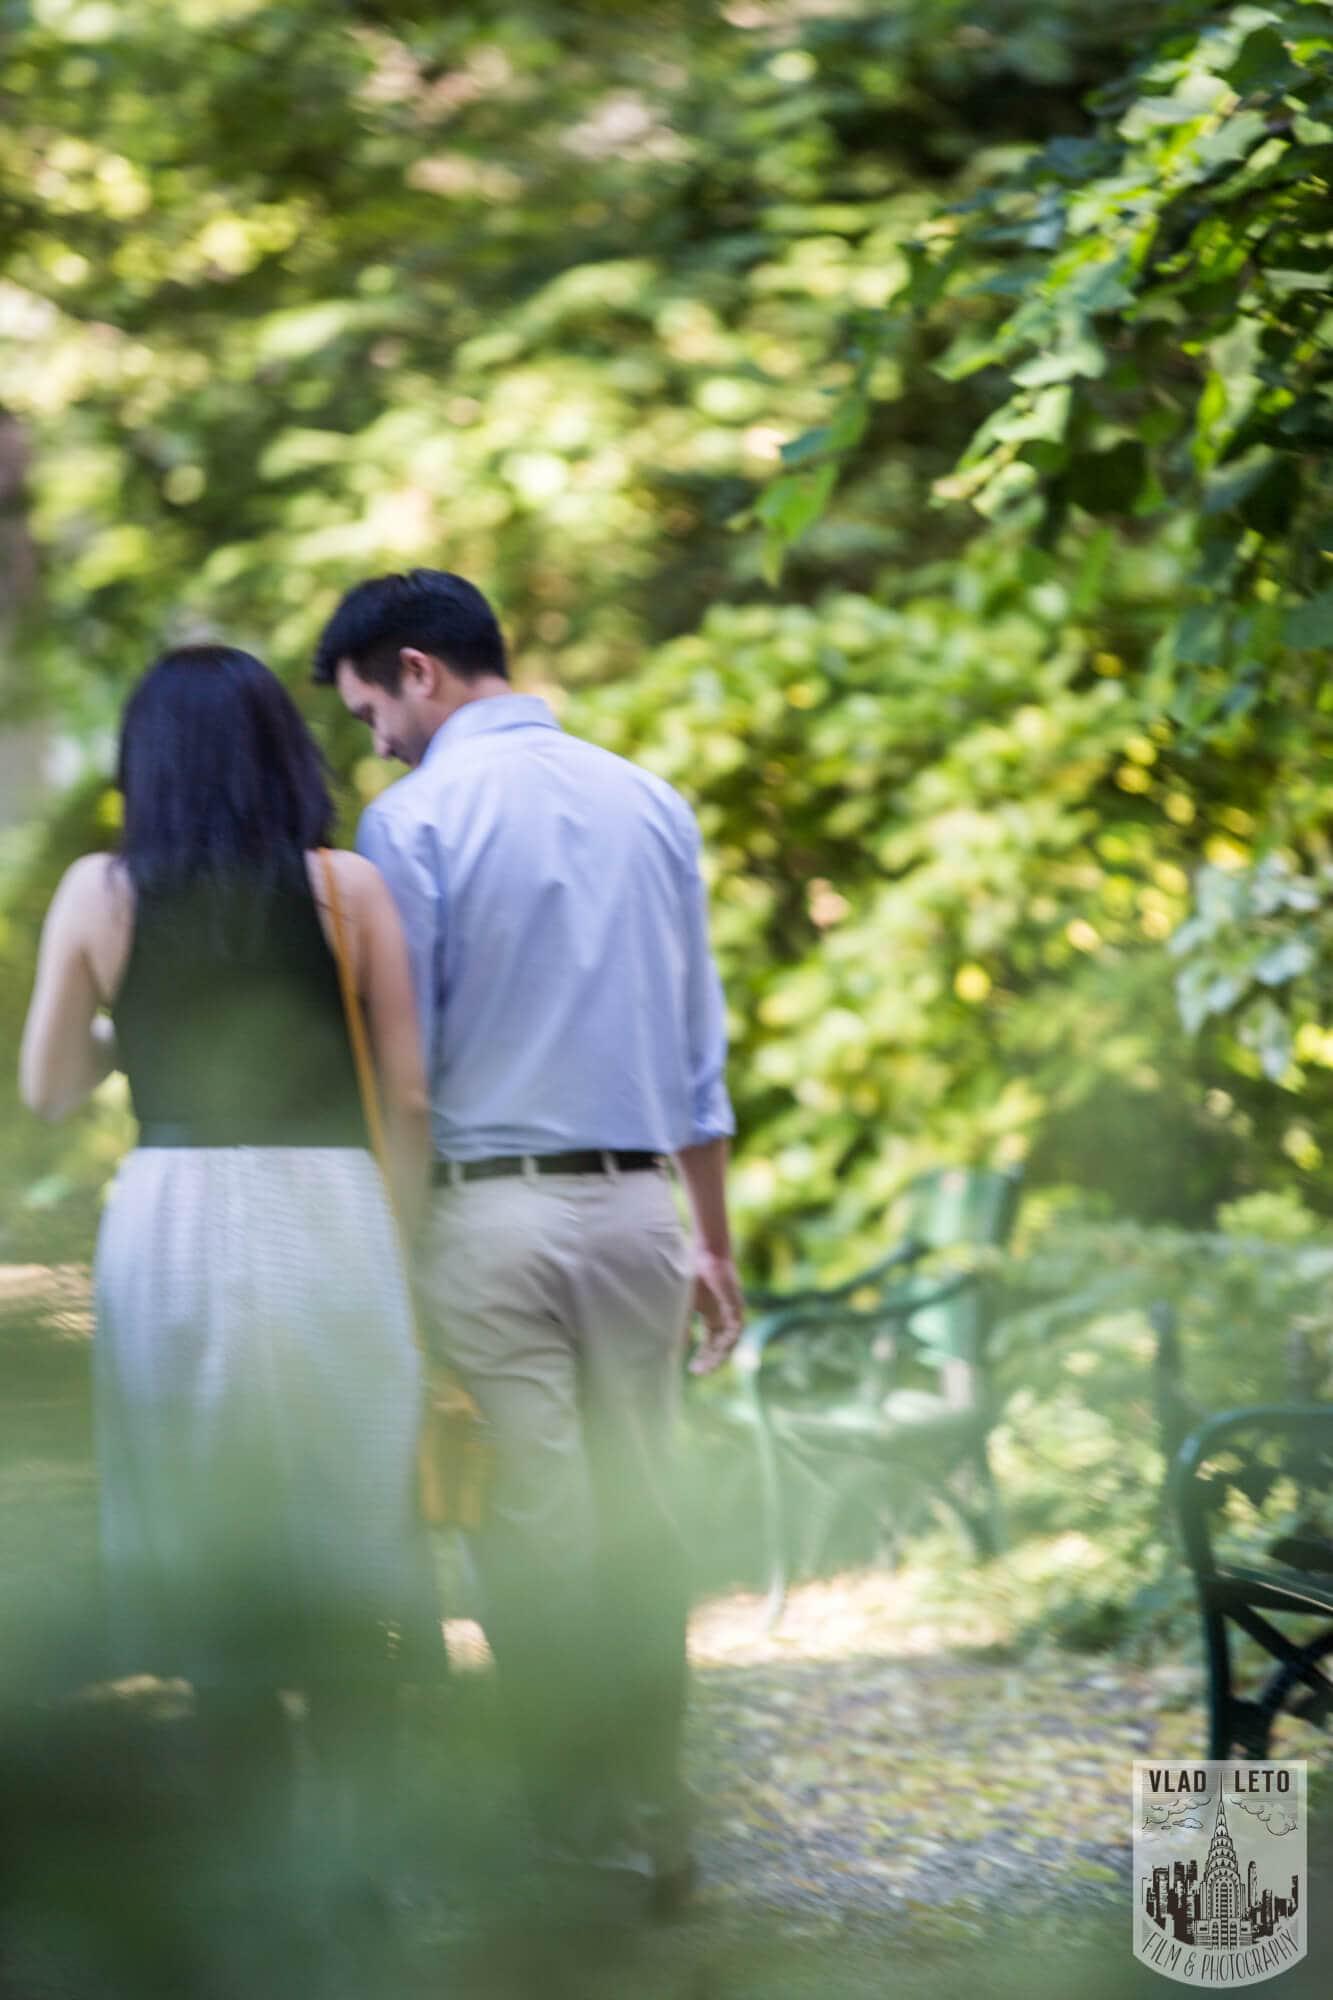 Photo 3 Gramercy Park Marriage Proposal | VladLeto